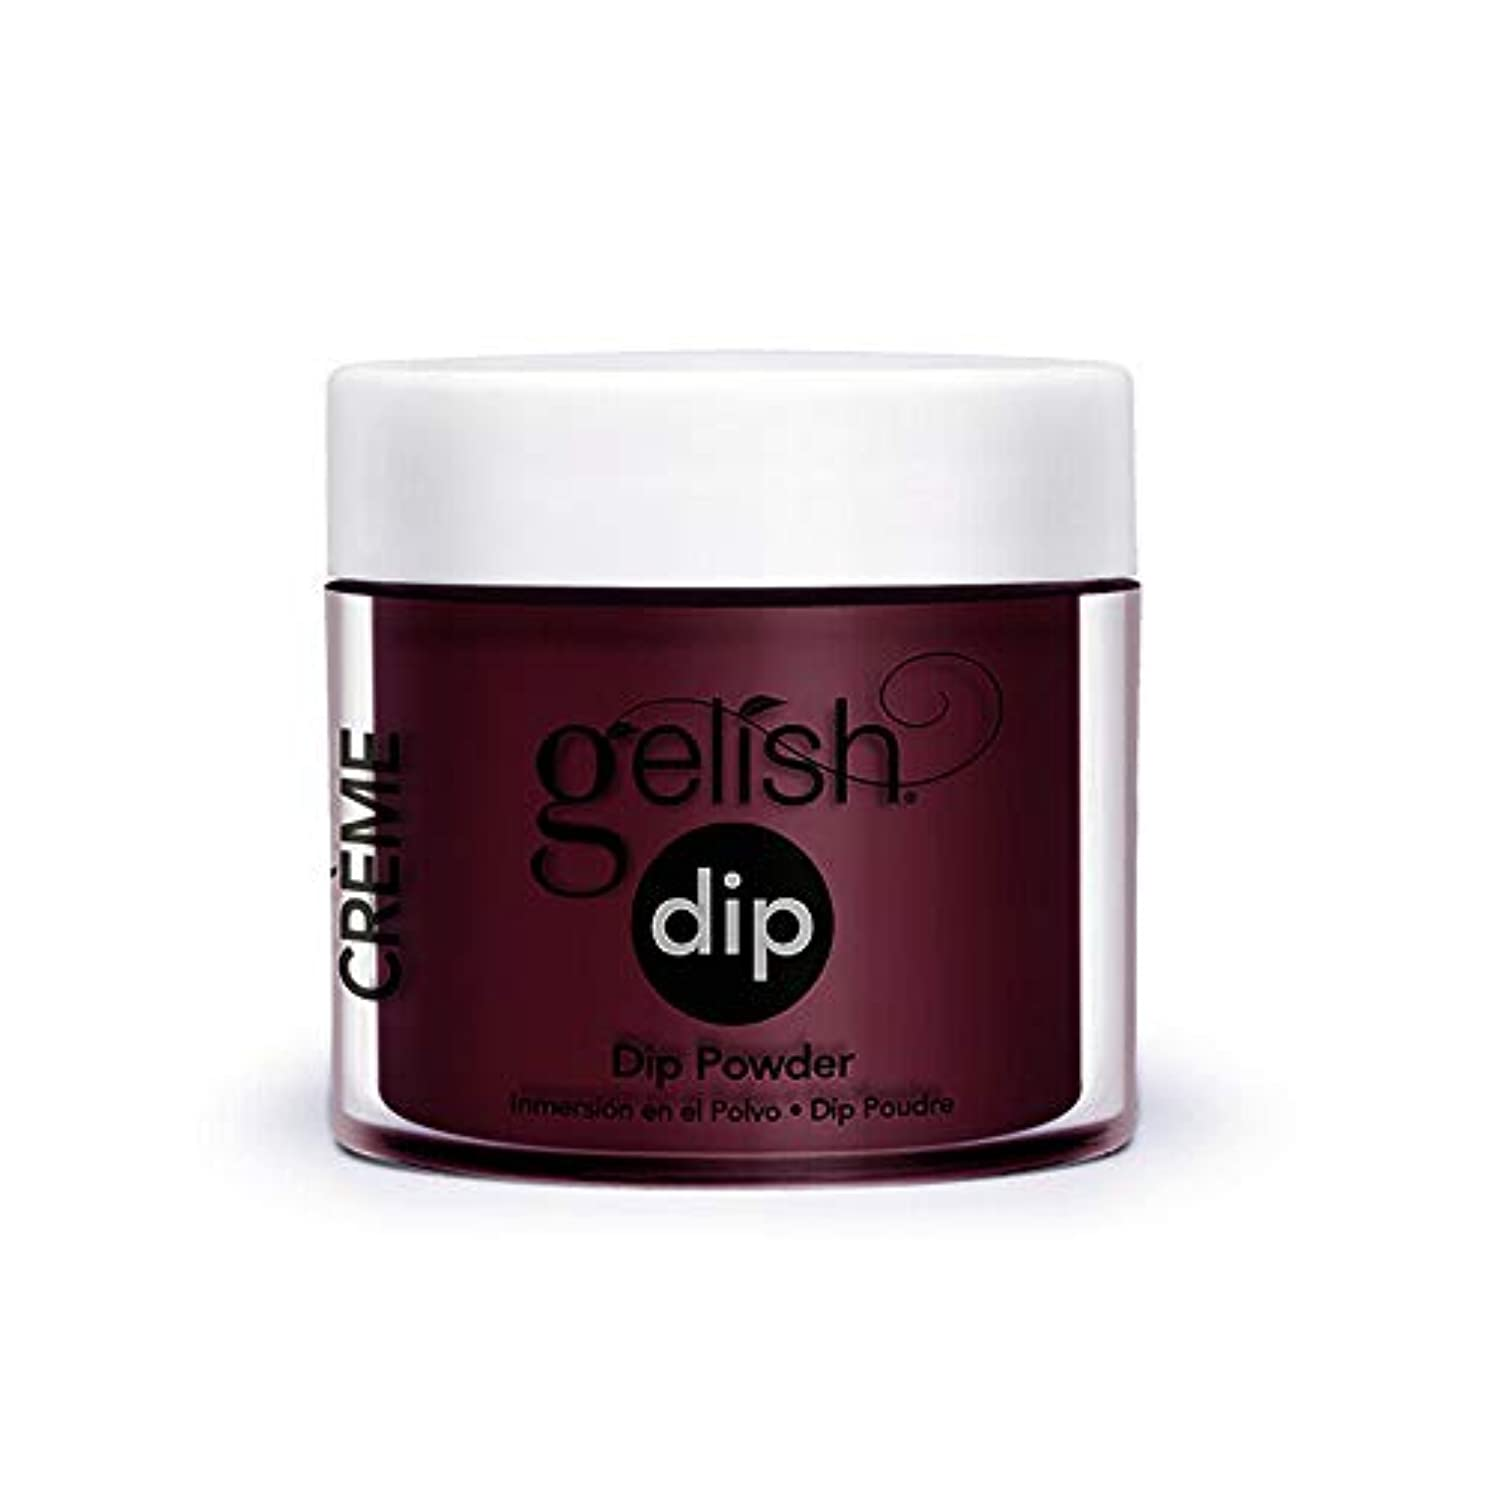 Harmony Gelish - Acrylic Dip Powder - Bella's Vampire - 23g / 0.8oz